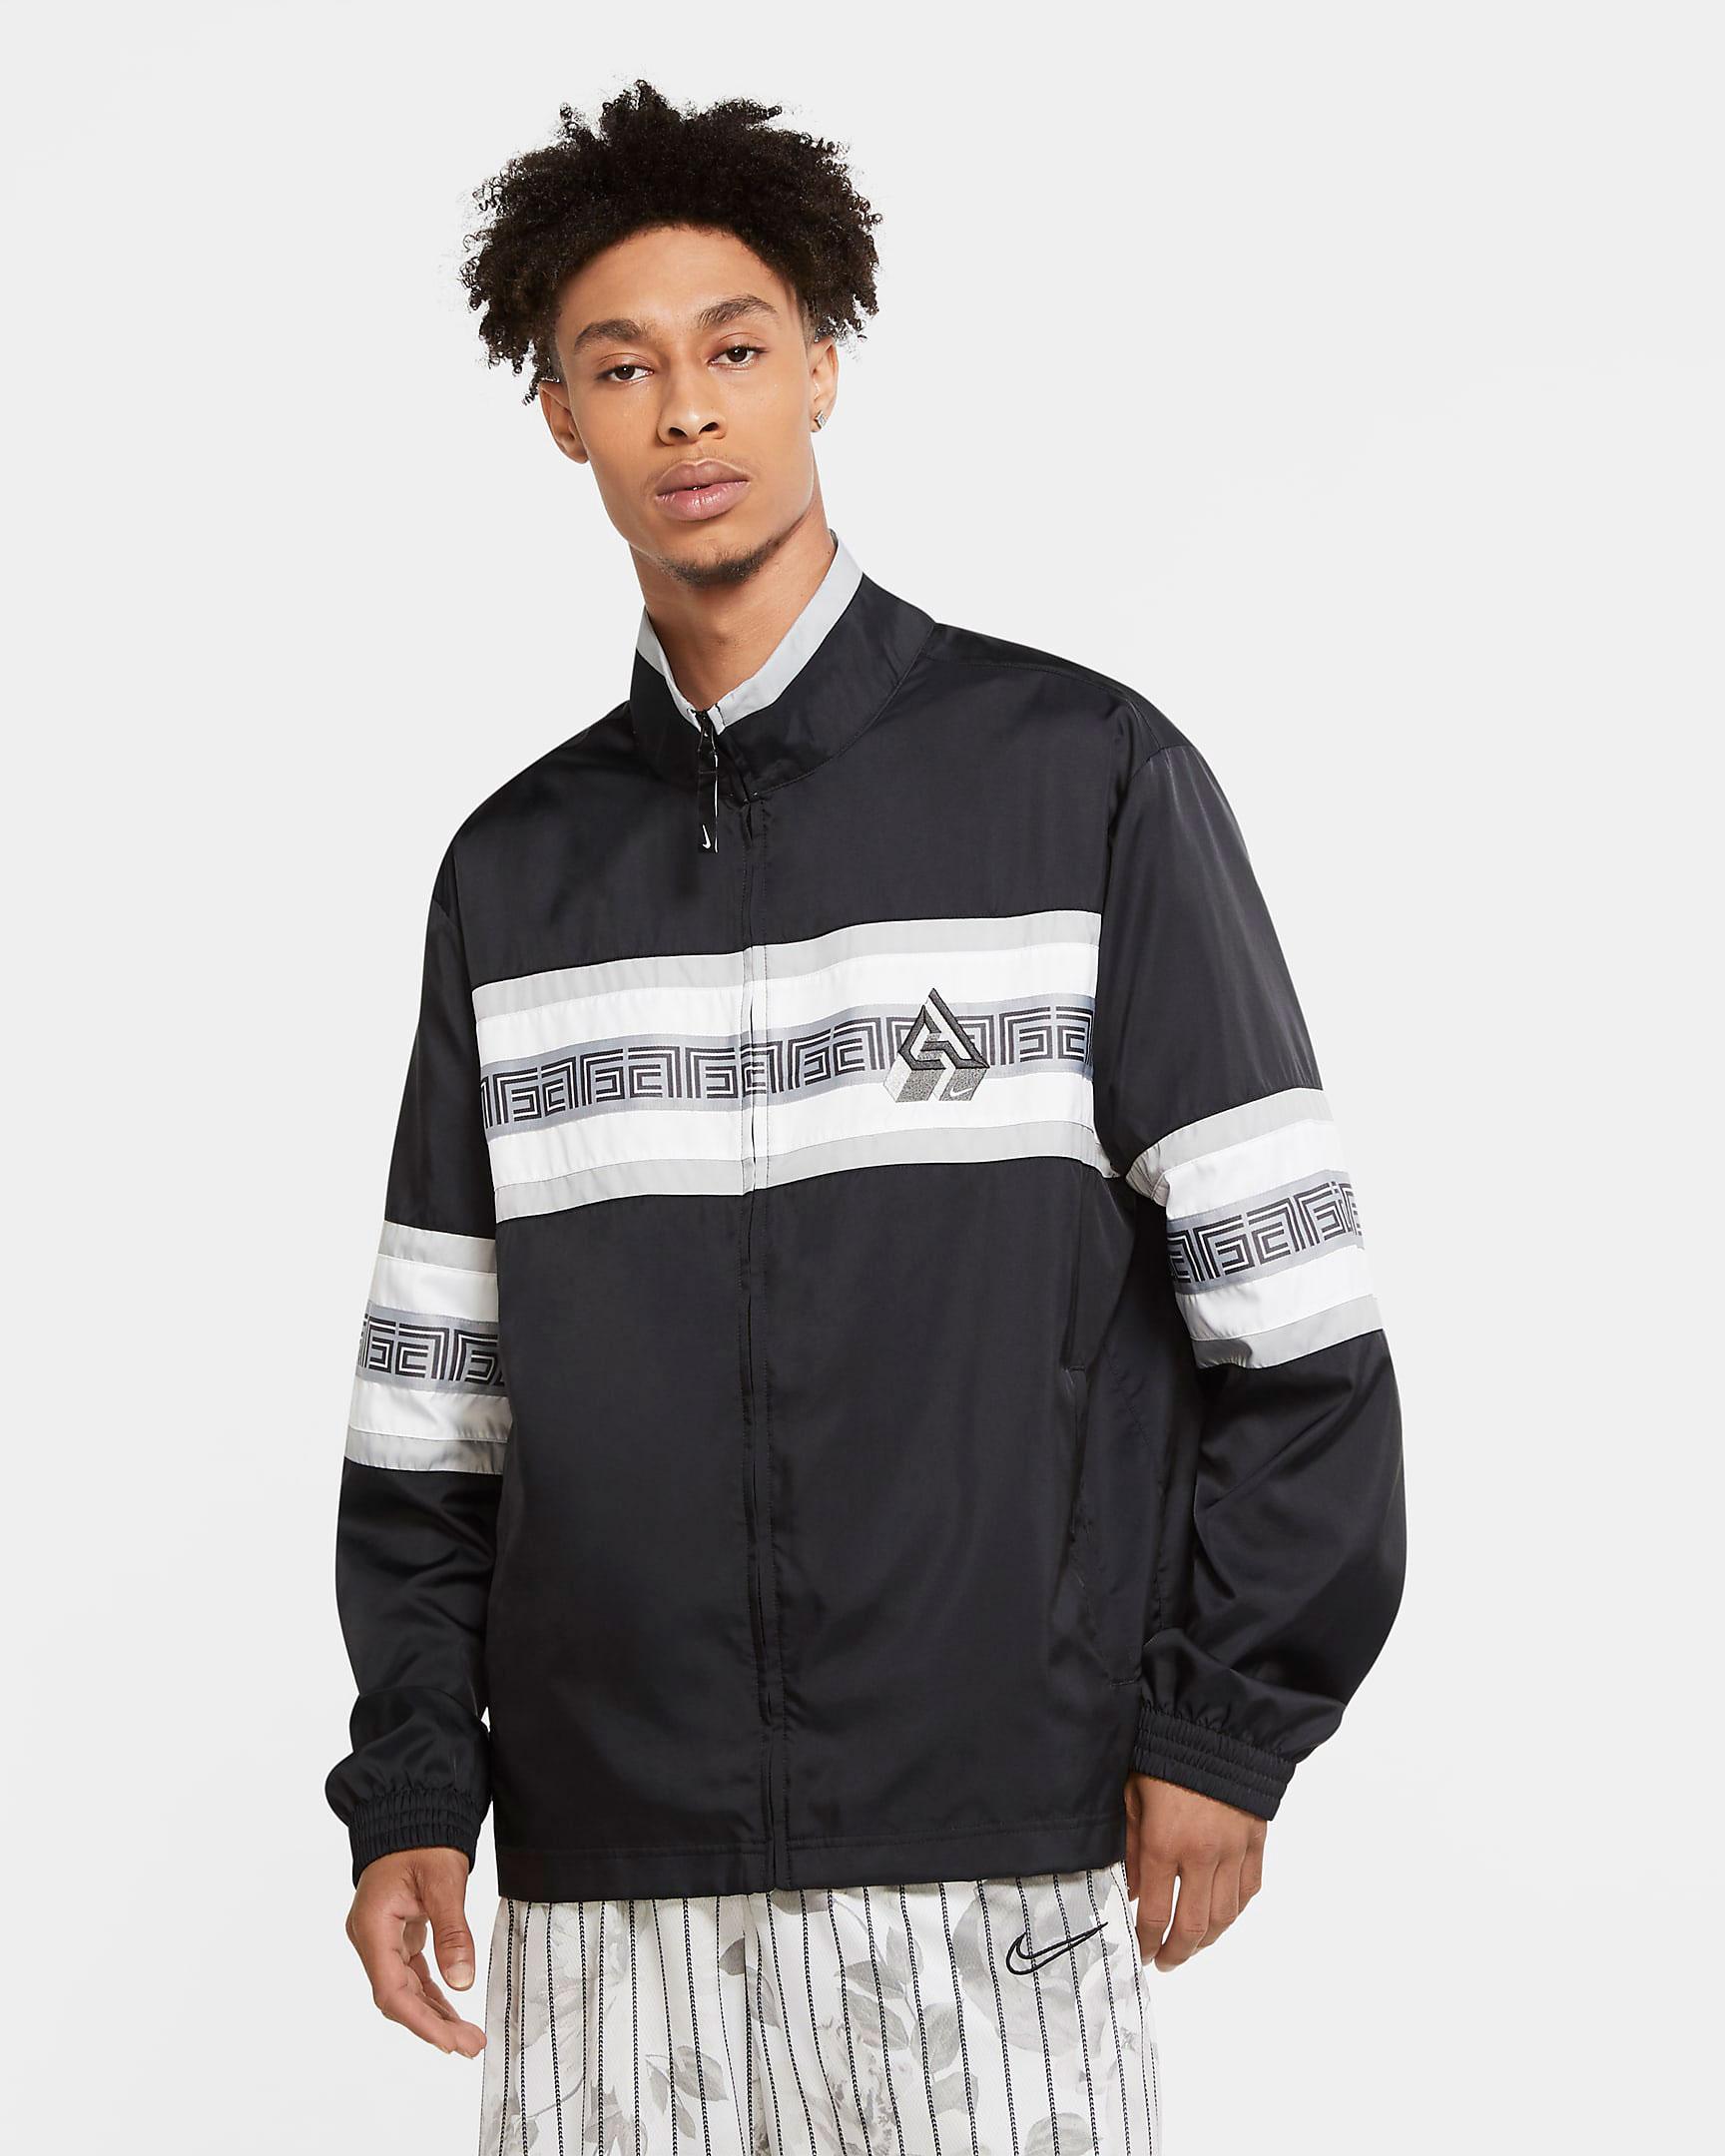 nike-giannis-jacket-black-white-1